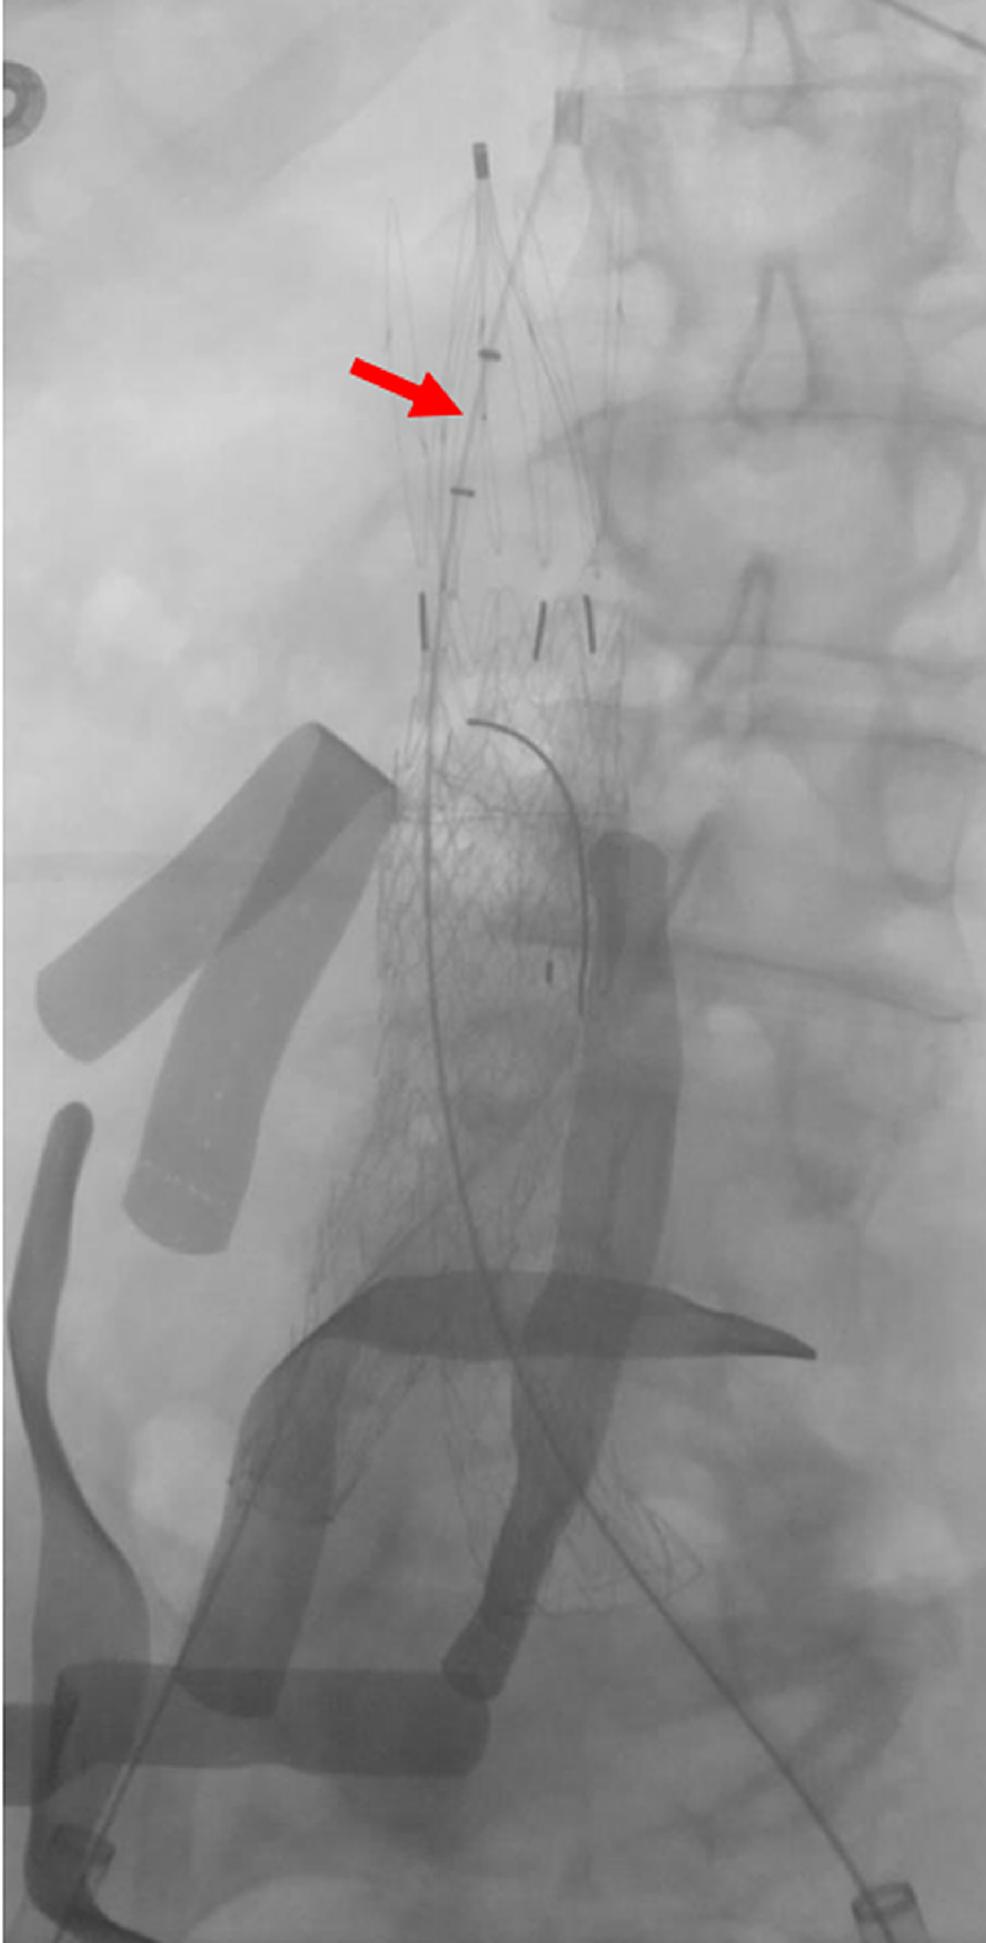 Angiojet®-Thrombectomy-Catheter-Within-the-Inferior-Vena-Cava-Filter